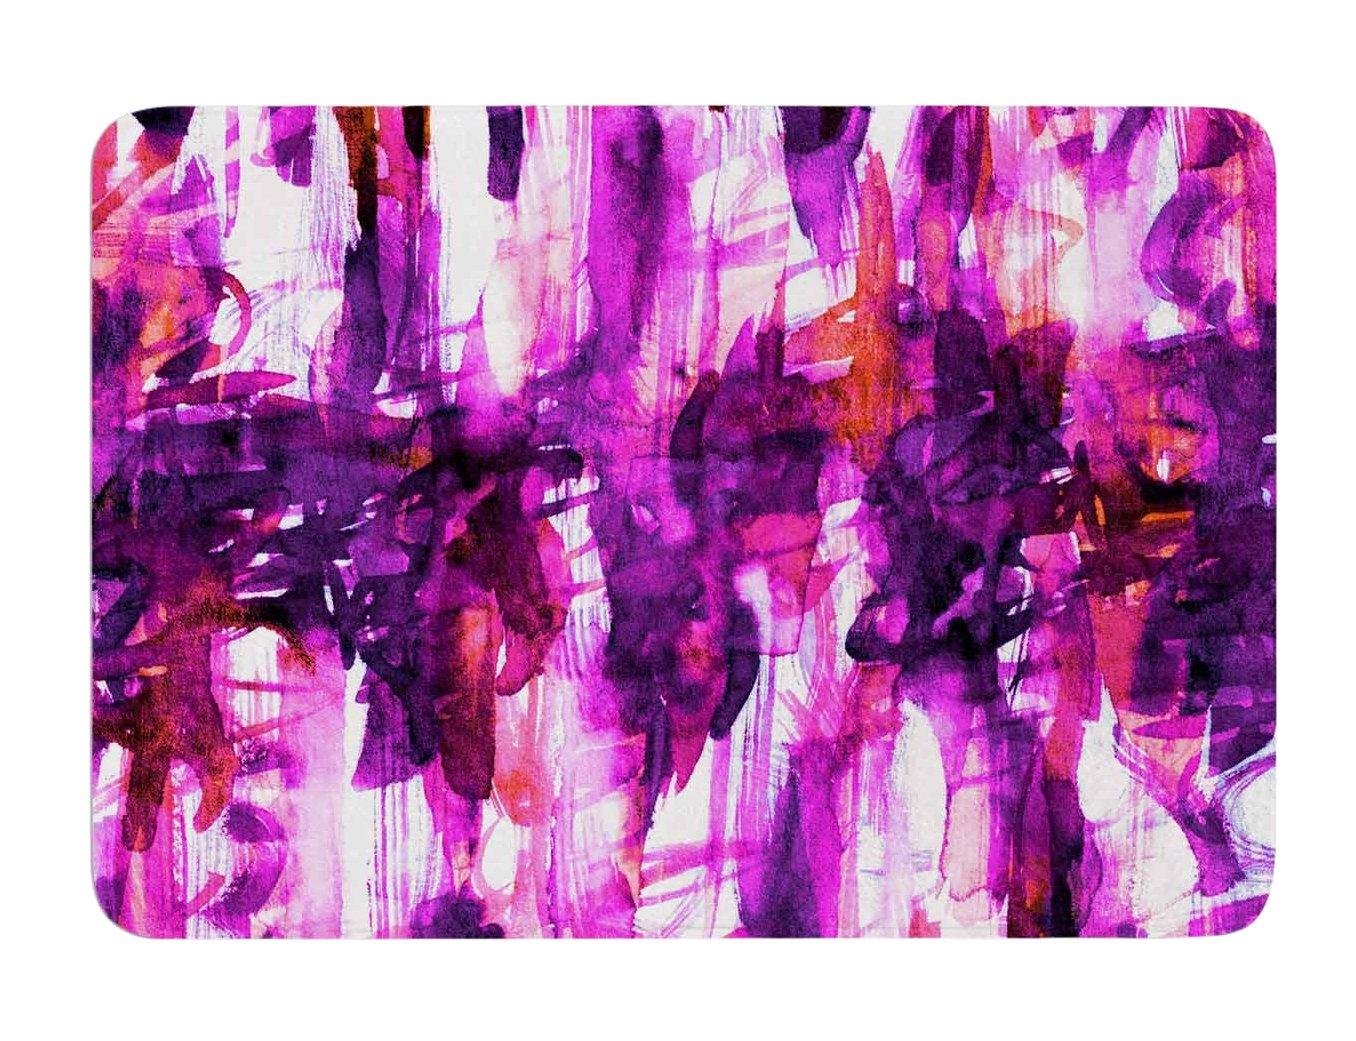 Kess InHouse EBI Emporium White Noise 3' Purple Magenta Memory Foam Bath Mat, 17 by 24-Inch, 17' X 24'